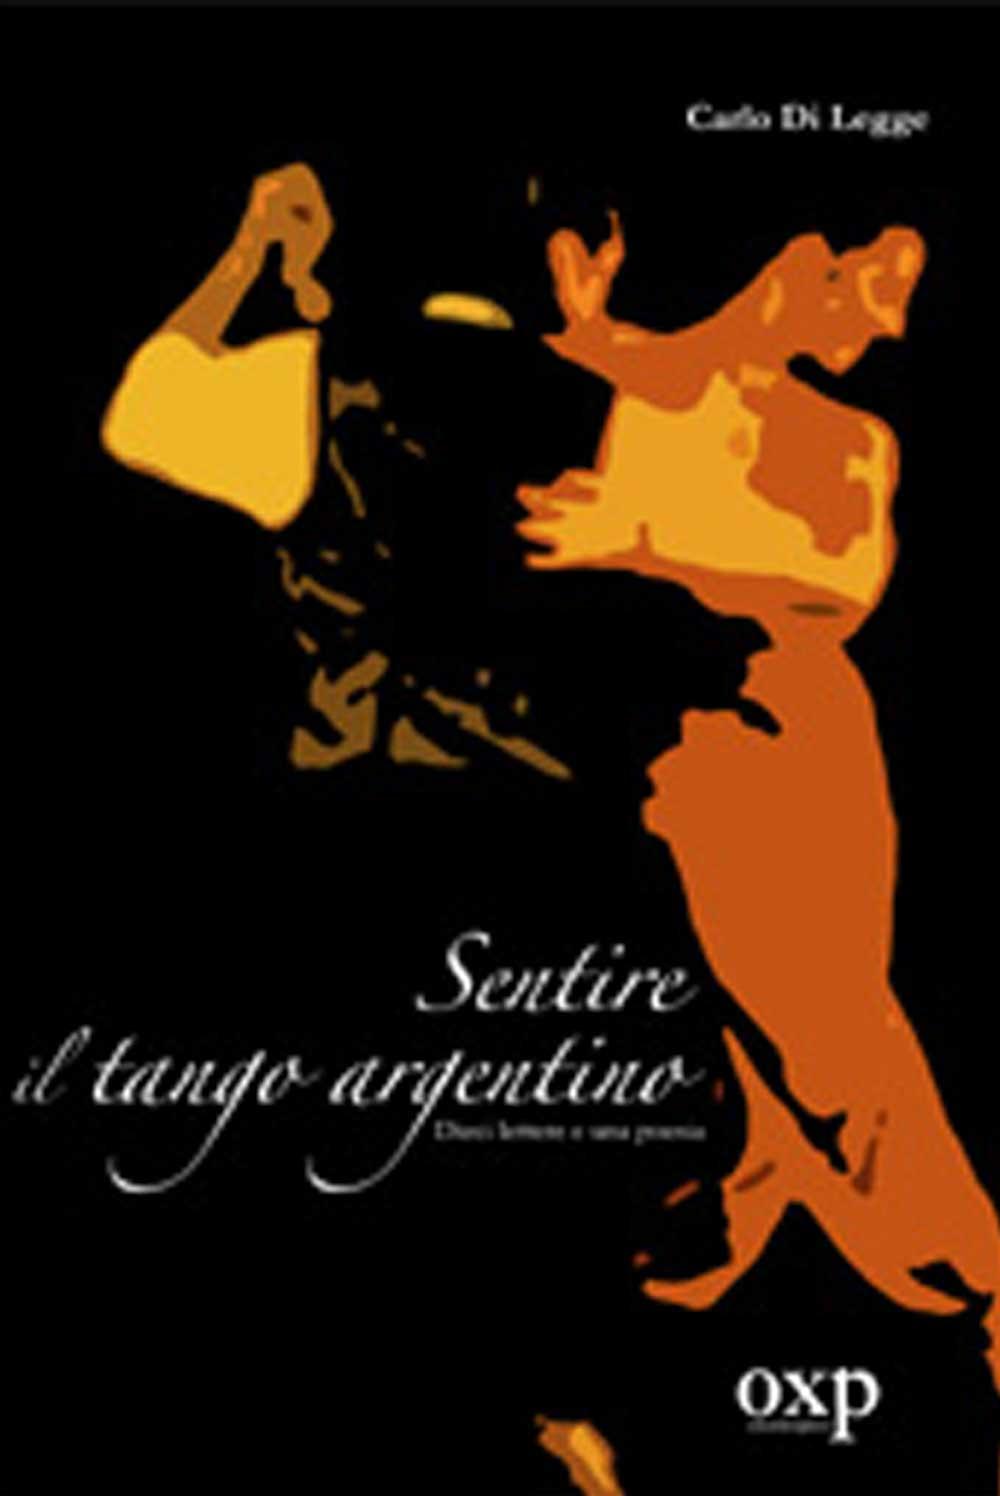 https://www.amazon.it/Sentire-tango-argentino-Carlo-Legge/dp/889500759X